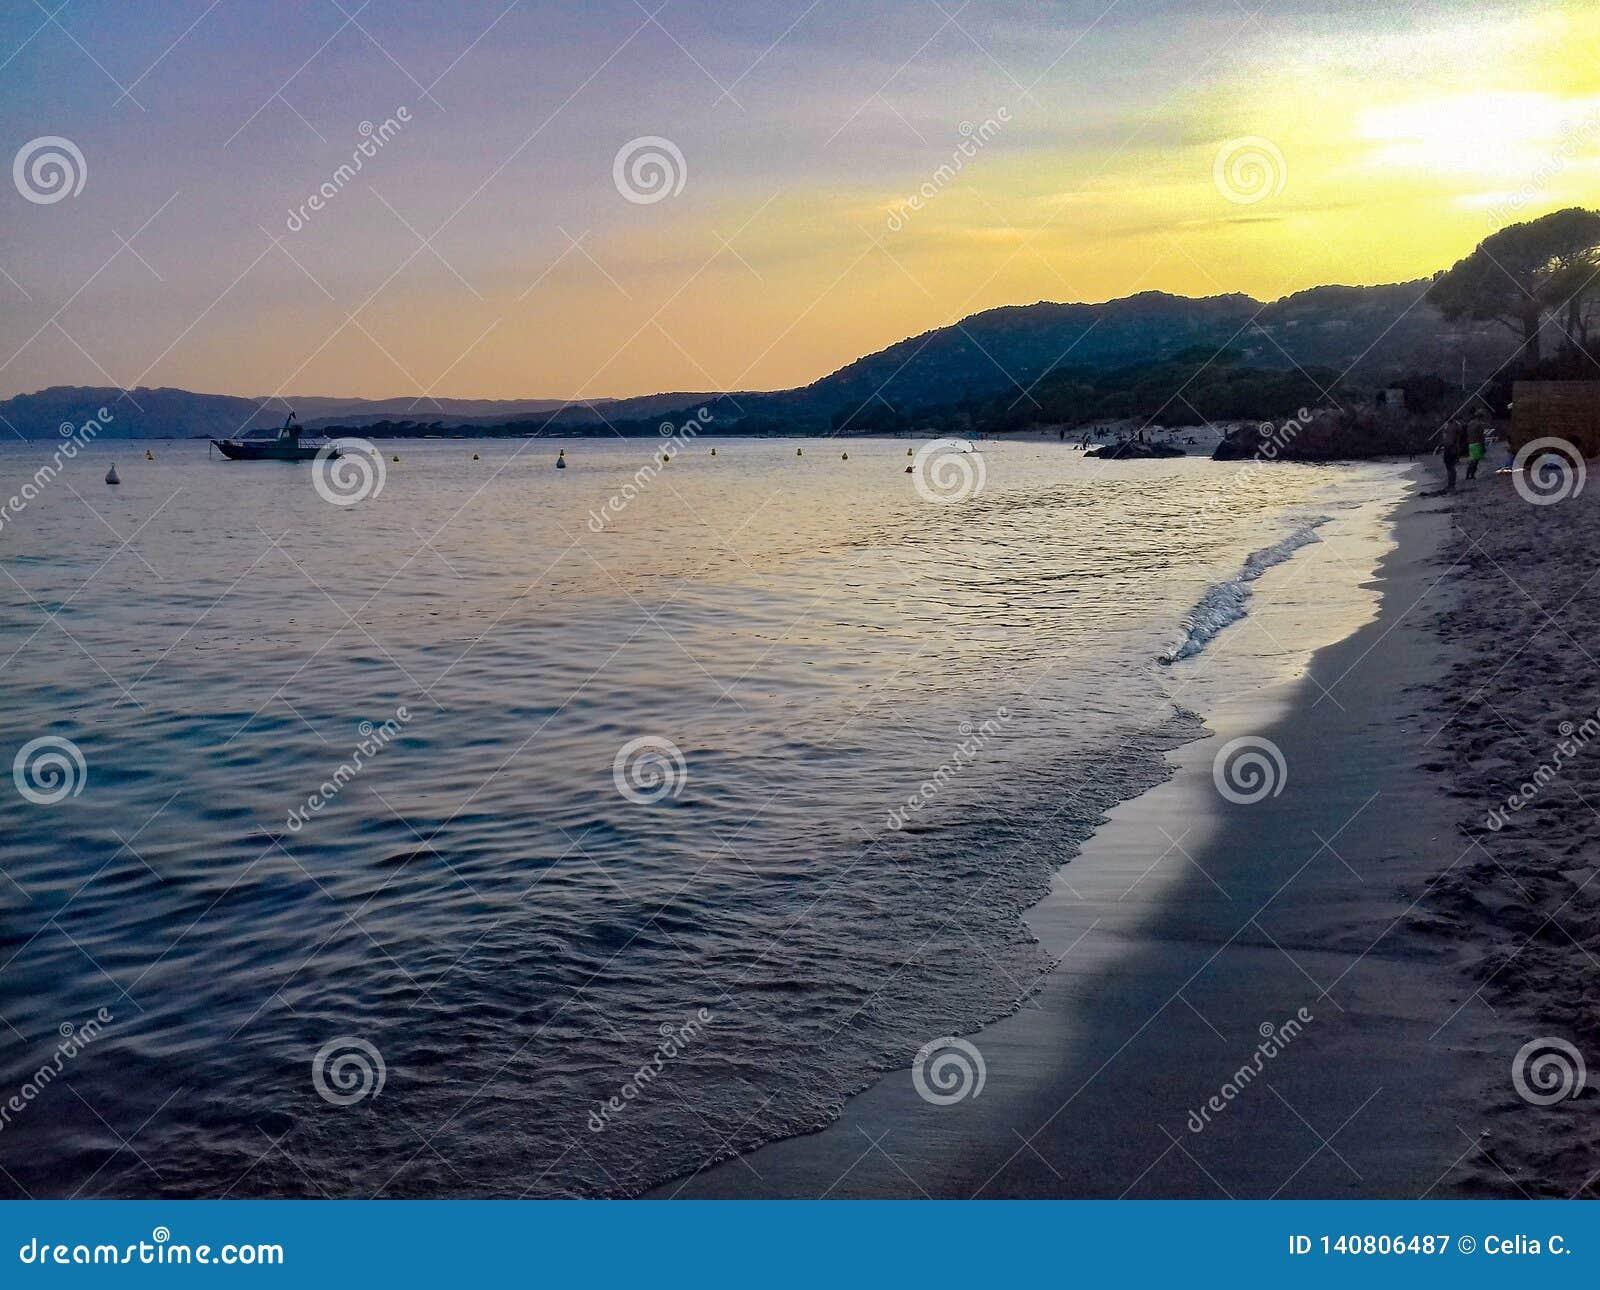 af7ae5ce4f77 corsica corsican outdoors rock nature sea ocean mediterranean corse blue sky  summer vacation travel tourist tourism beach landscape island seascape bay  ...